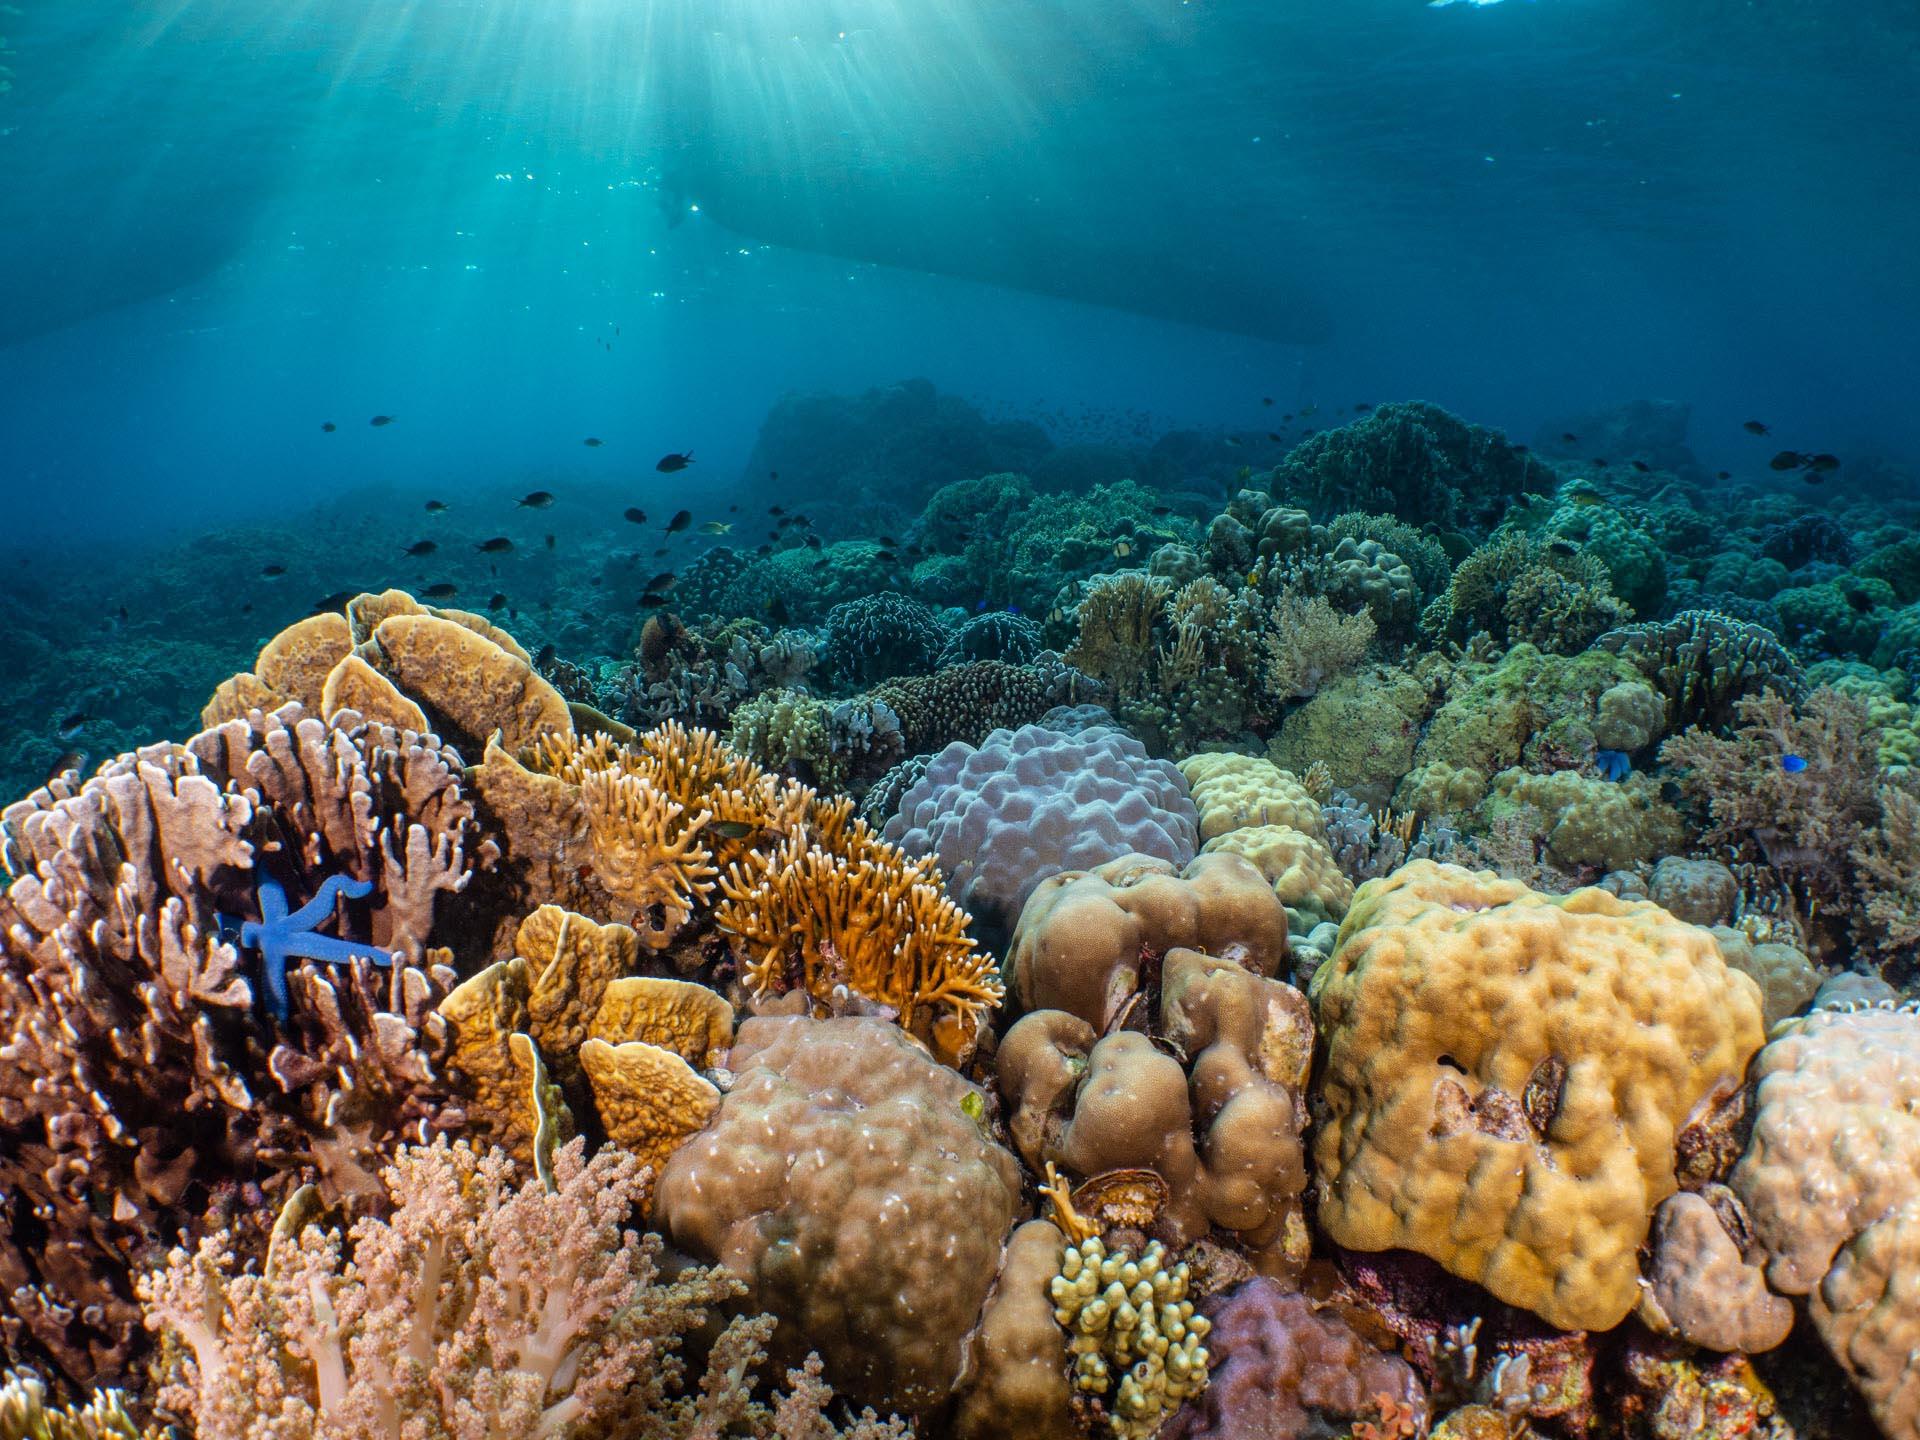 Coral Reef Scene with beautiful light in pescador island